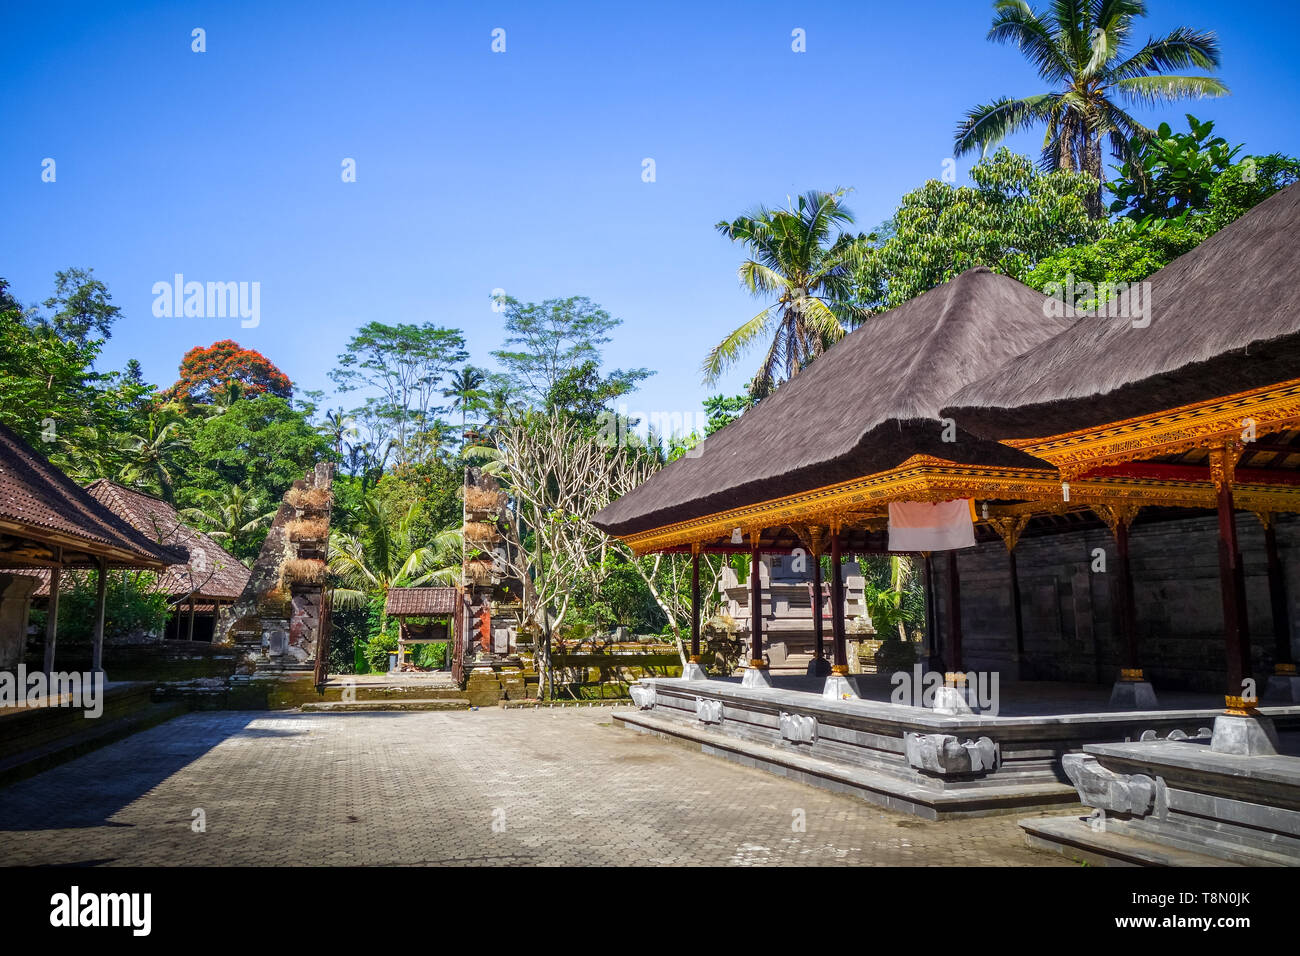 Gunung Kawi funerary temple complex, Tampaksiring, Ubud, Bali, Indonesia - Stock Image